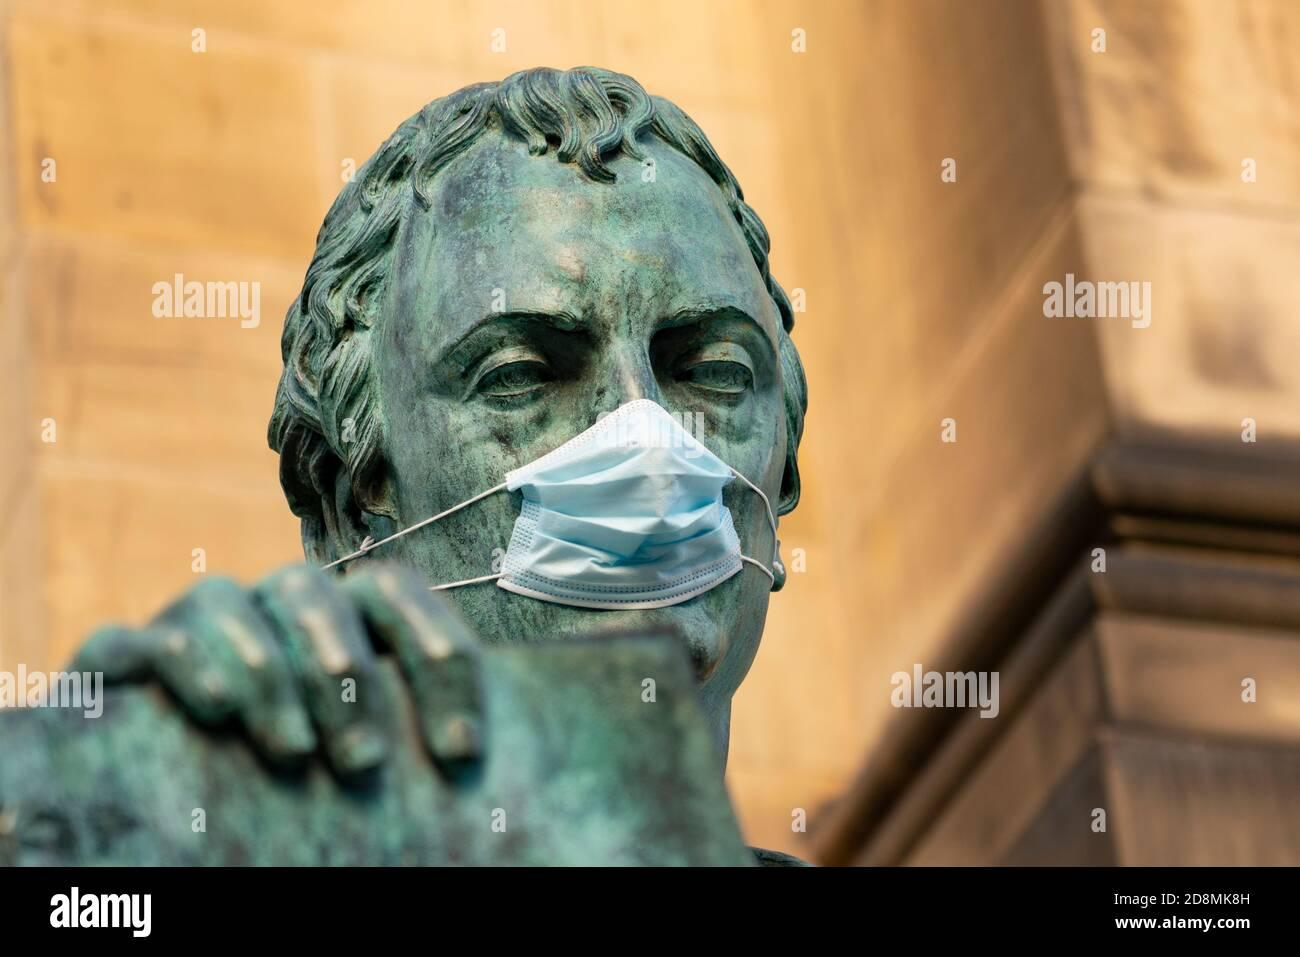 Statue of David Hume philosopher wearing facemask  on Royal Mile in Edinburgh, Scotland, UK Stock Photo